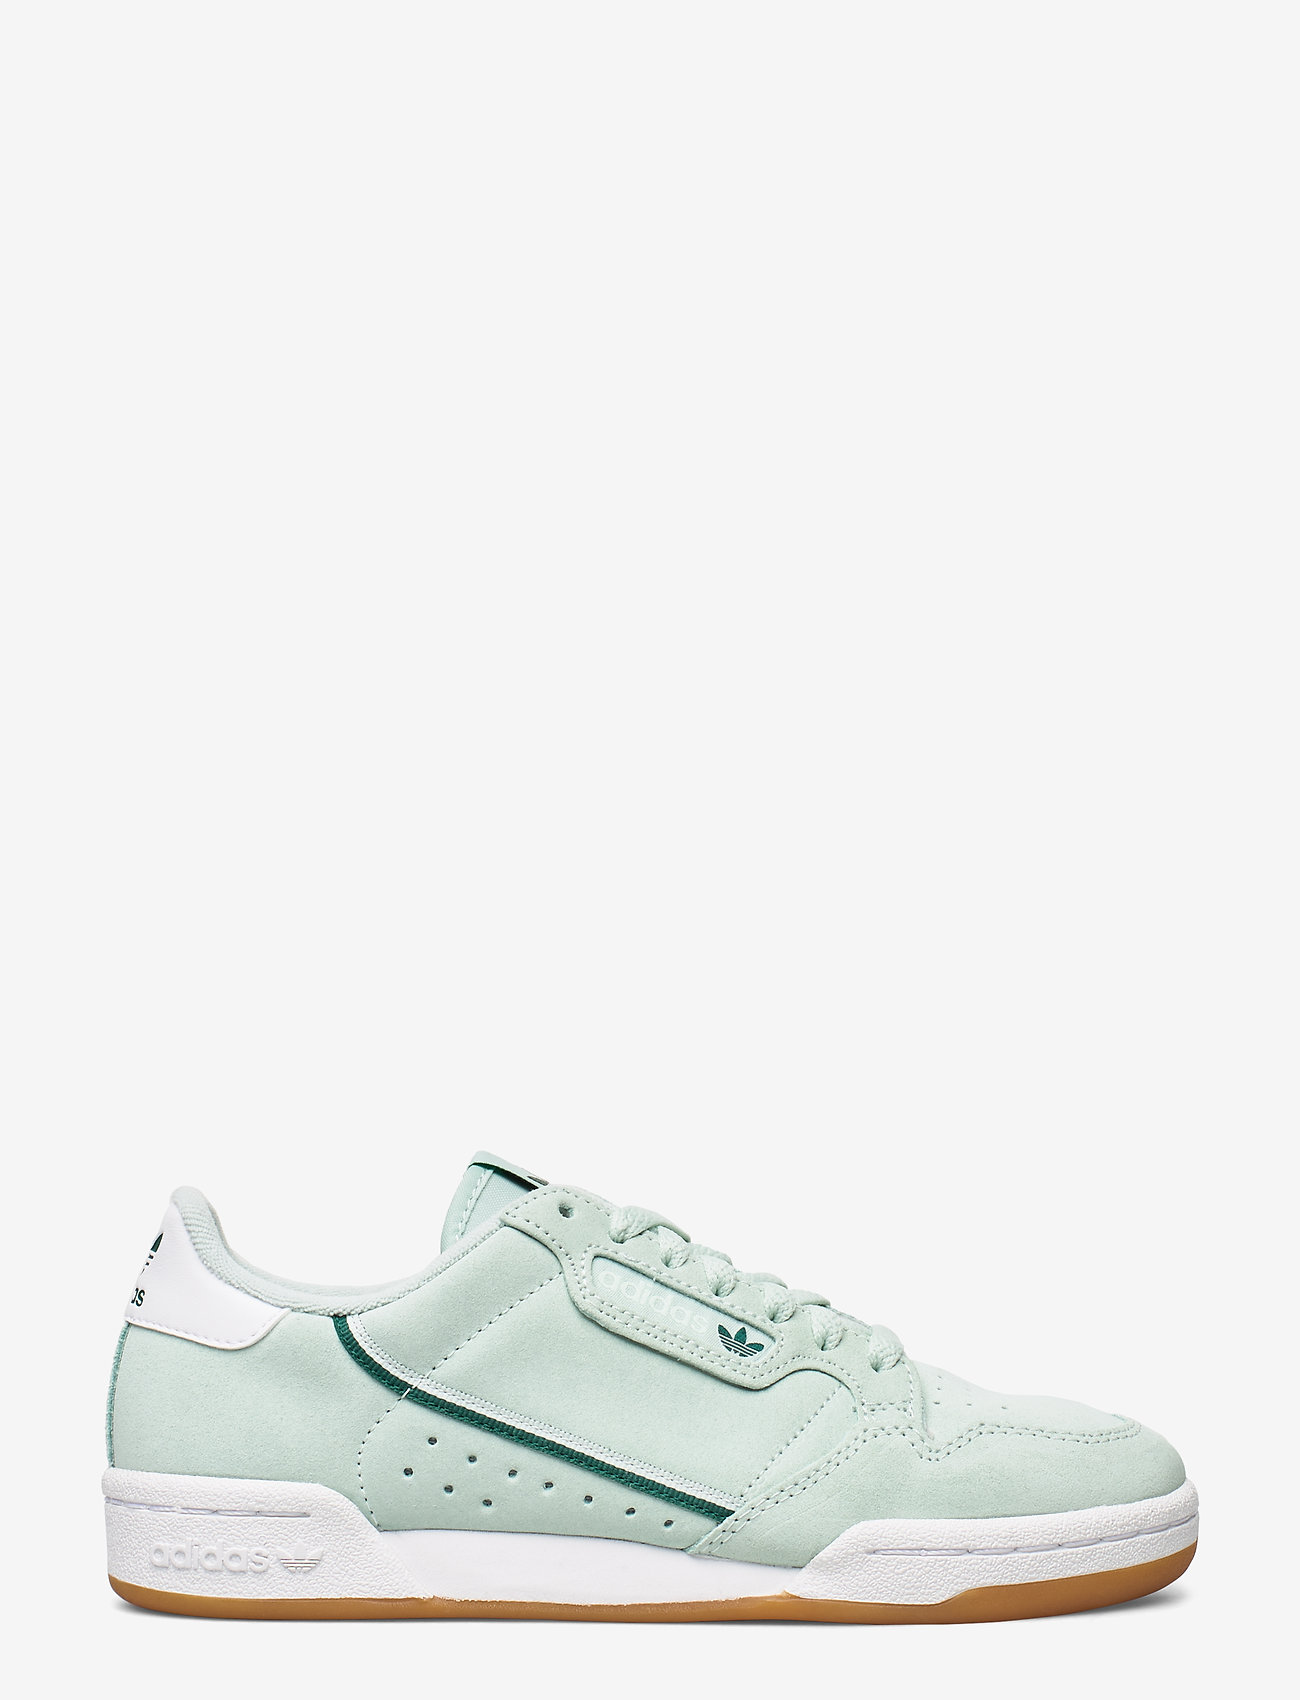 Adidas Originals Continental 80 W - Baskets